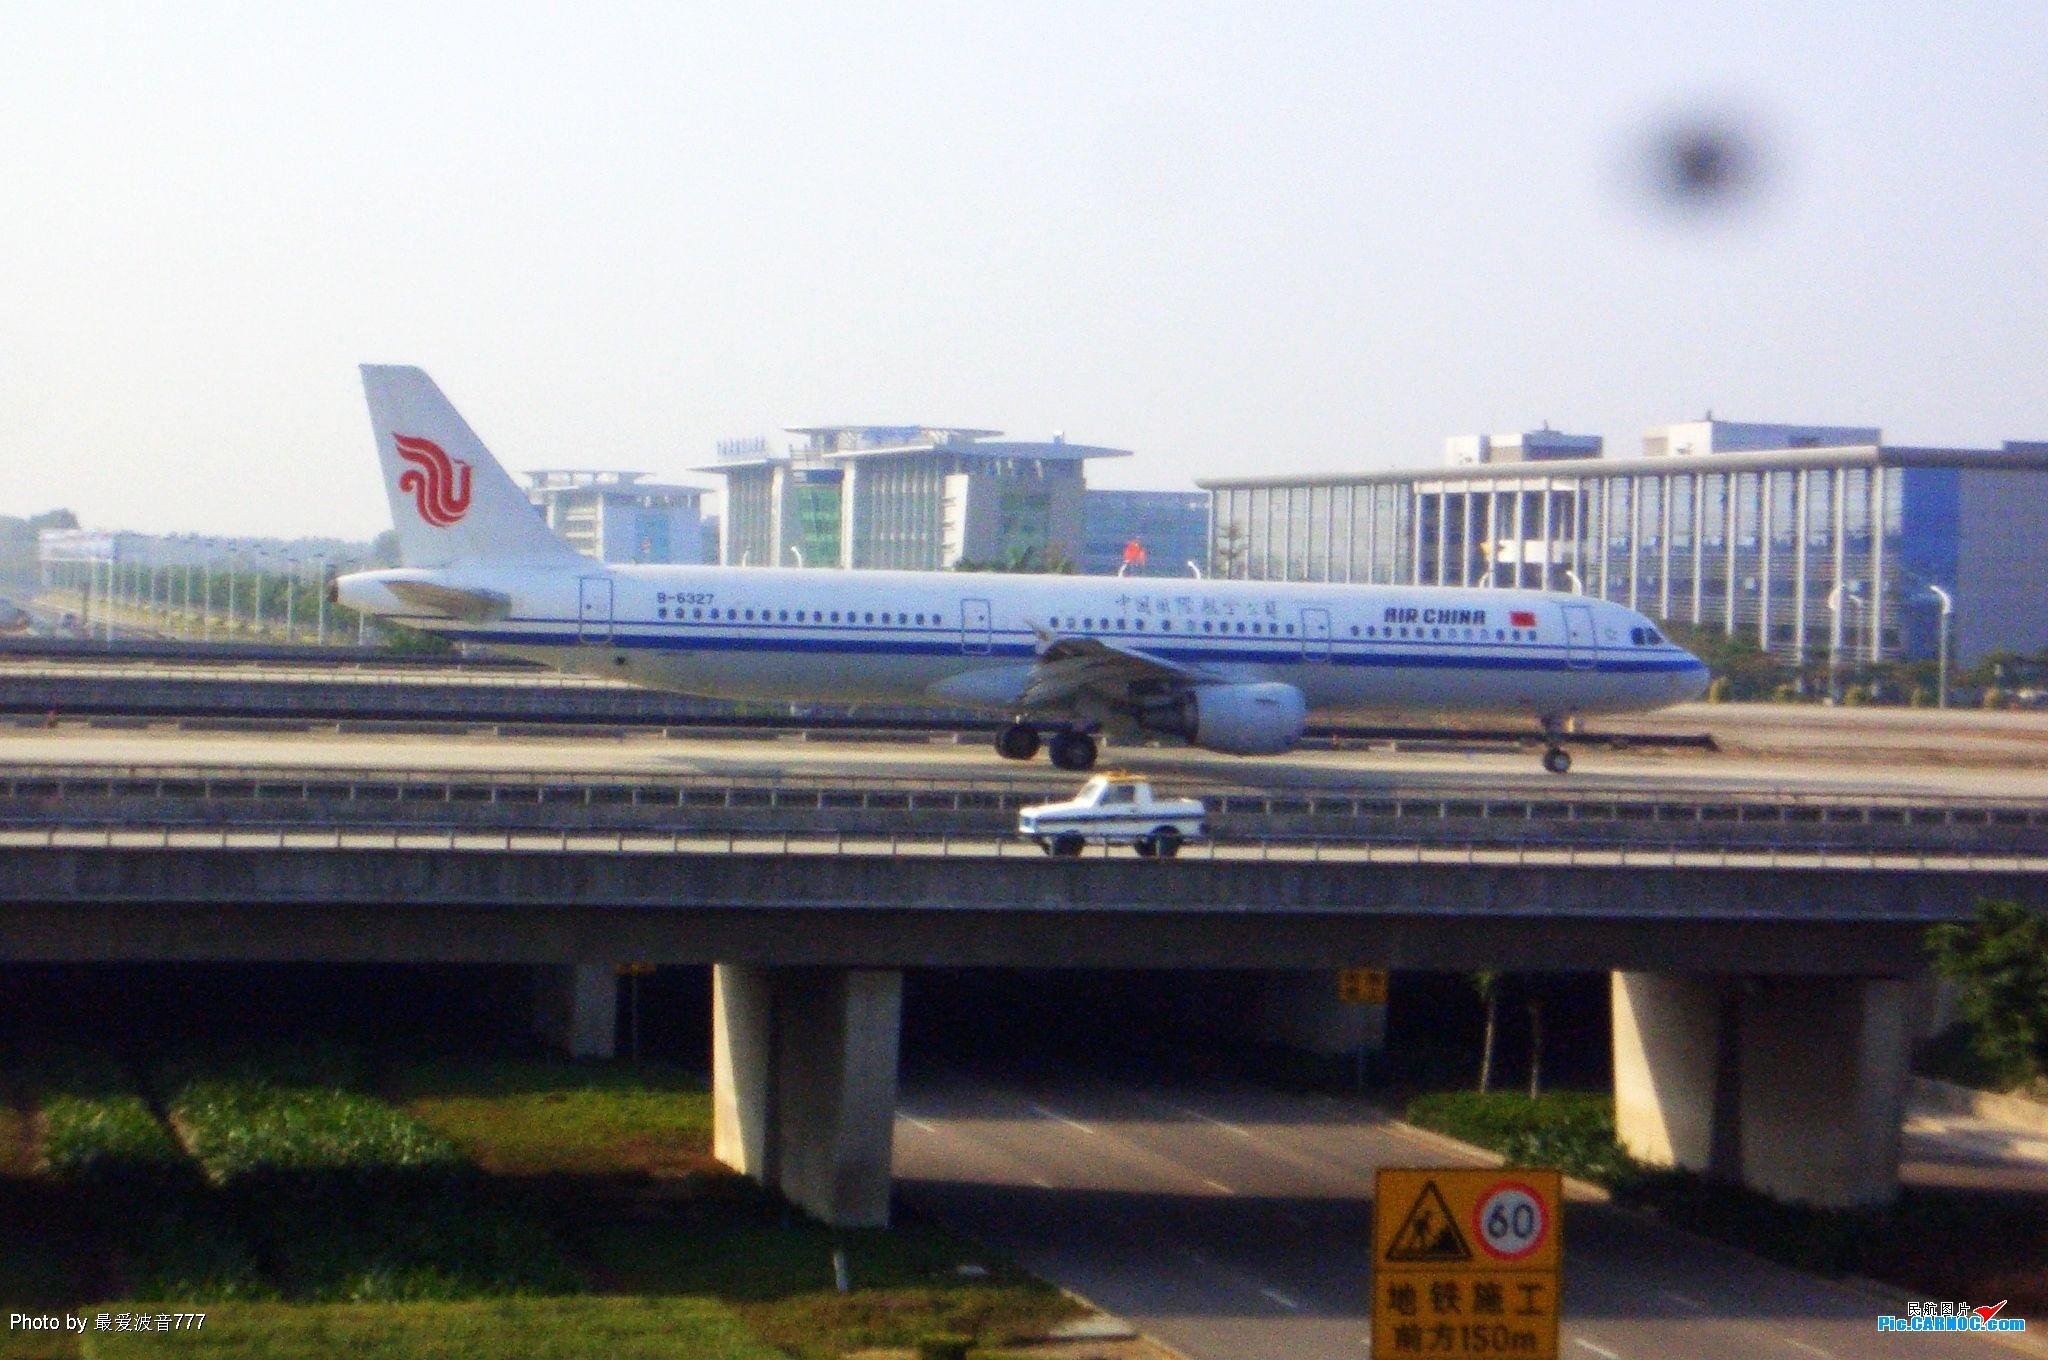 Re:[原创]恢复信心后的第一次发帖,09年第一次活动 AIRBUS A321-200 B-6327 广州白云国际机场